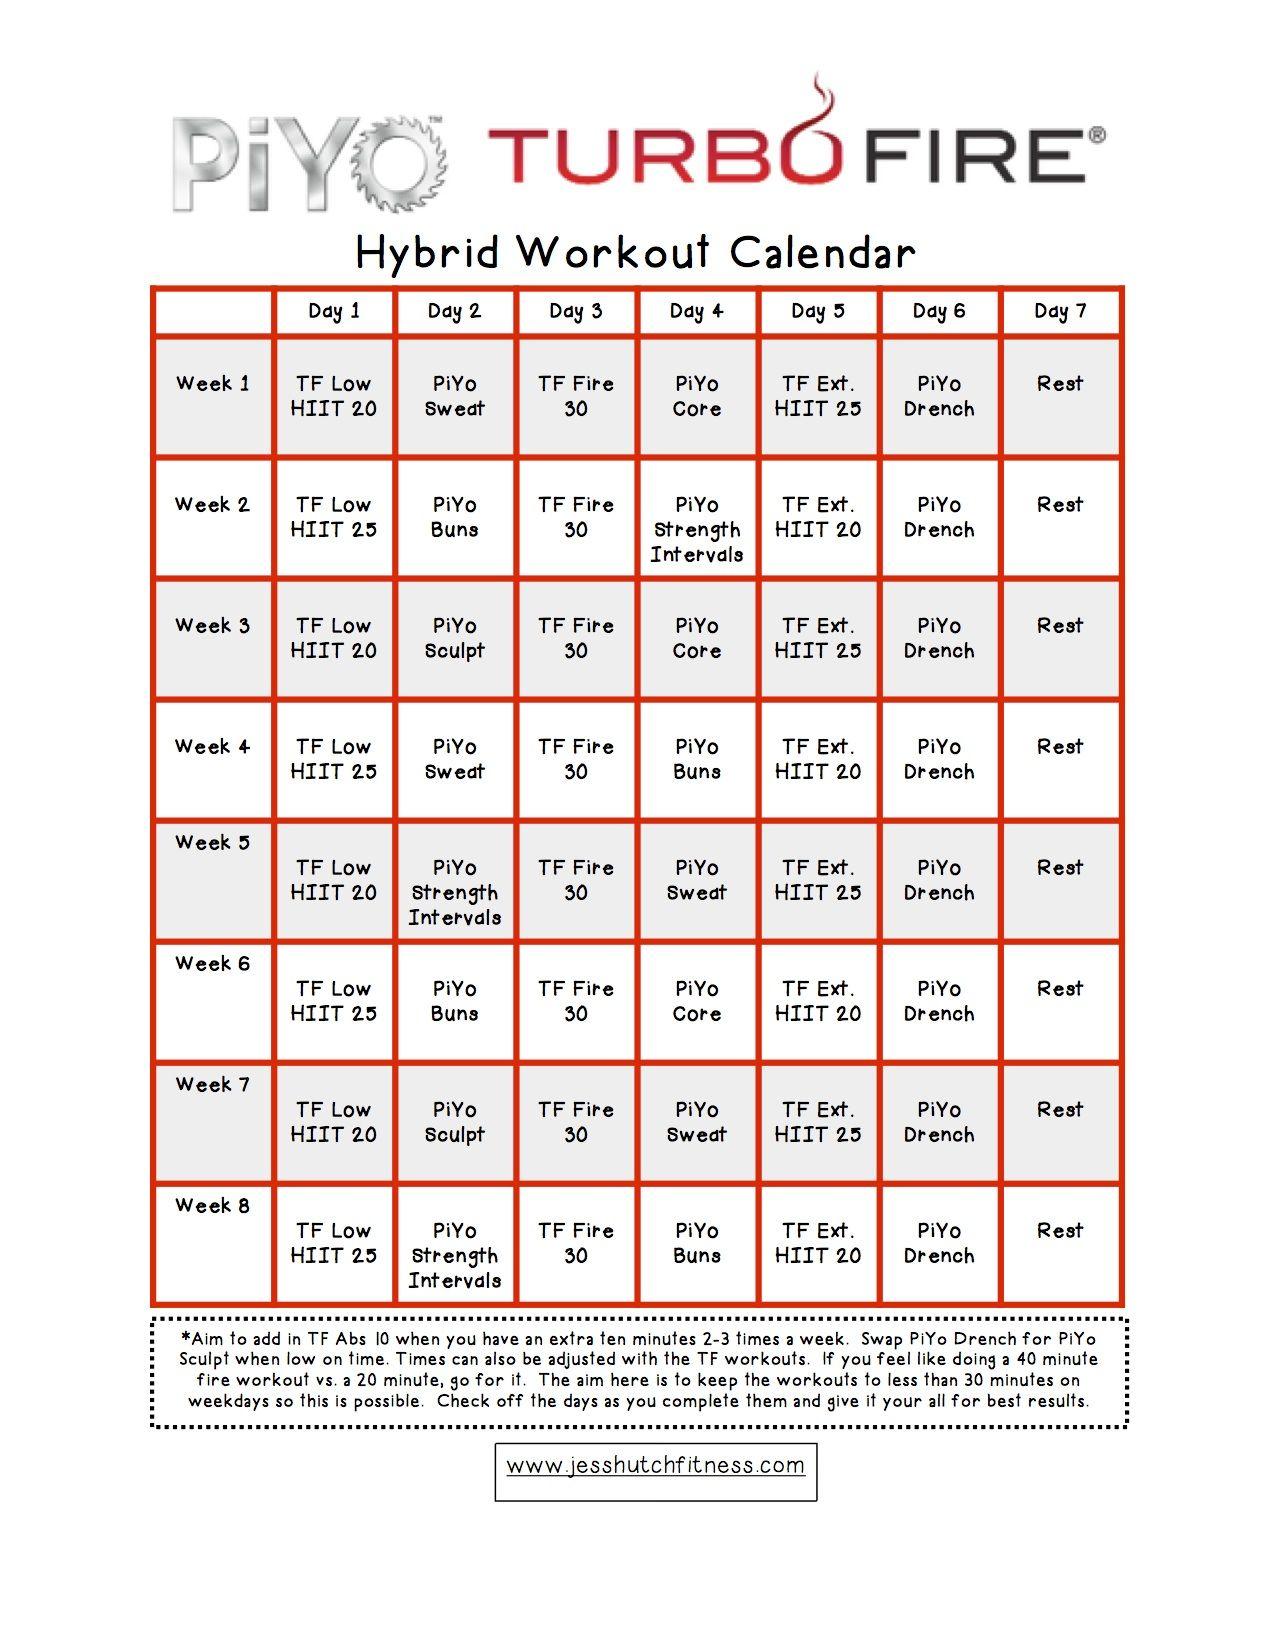 Turbo Fire Calendar Week 5 | Calendar Printables Free regarding Piyo Calendar Printable